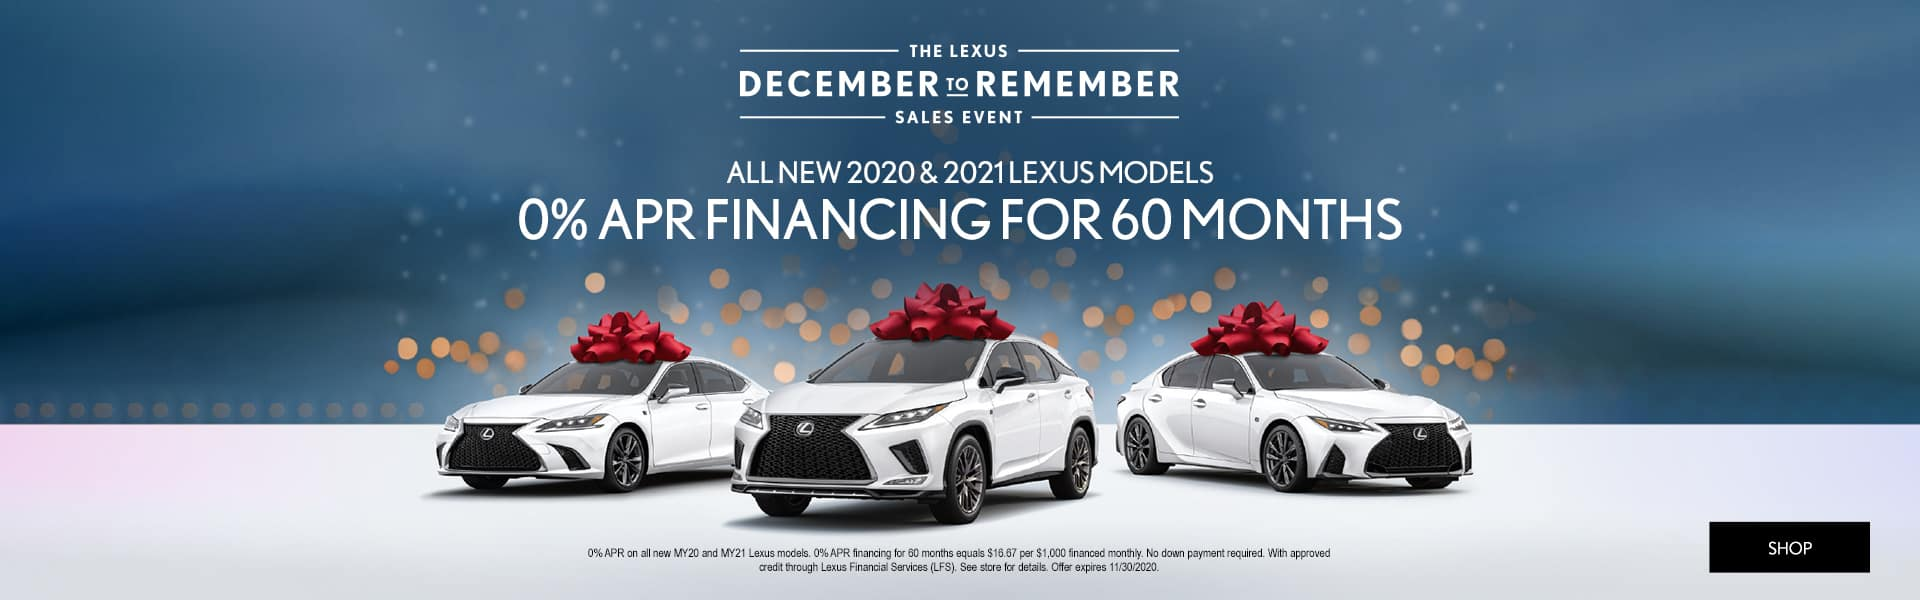 Lexus-December-to-Remember(1920x600)